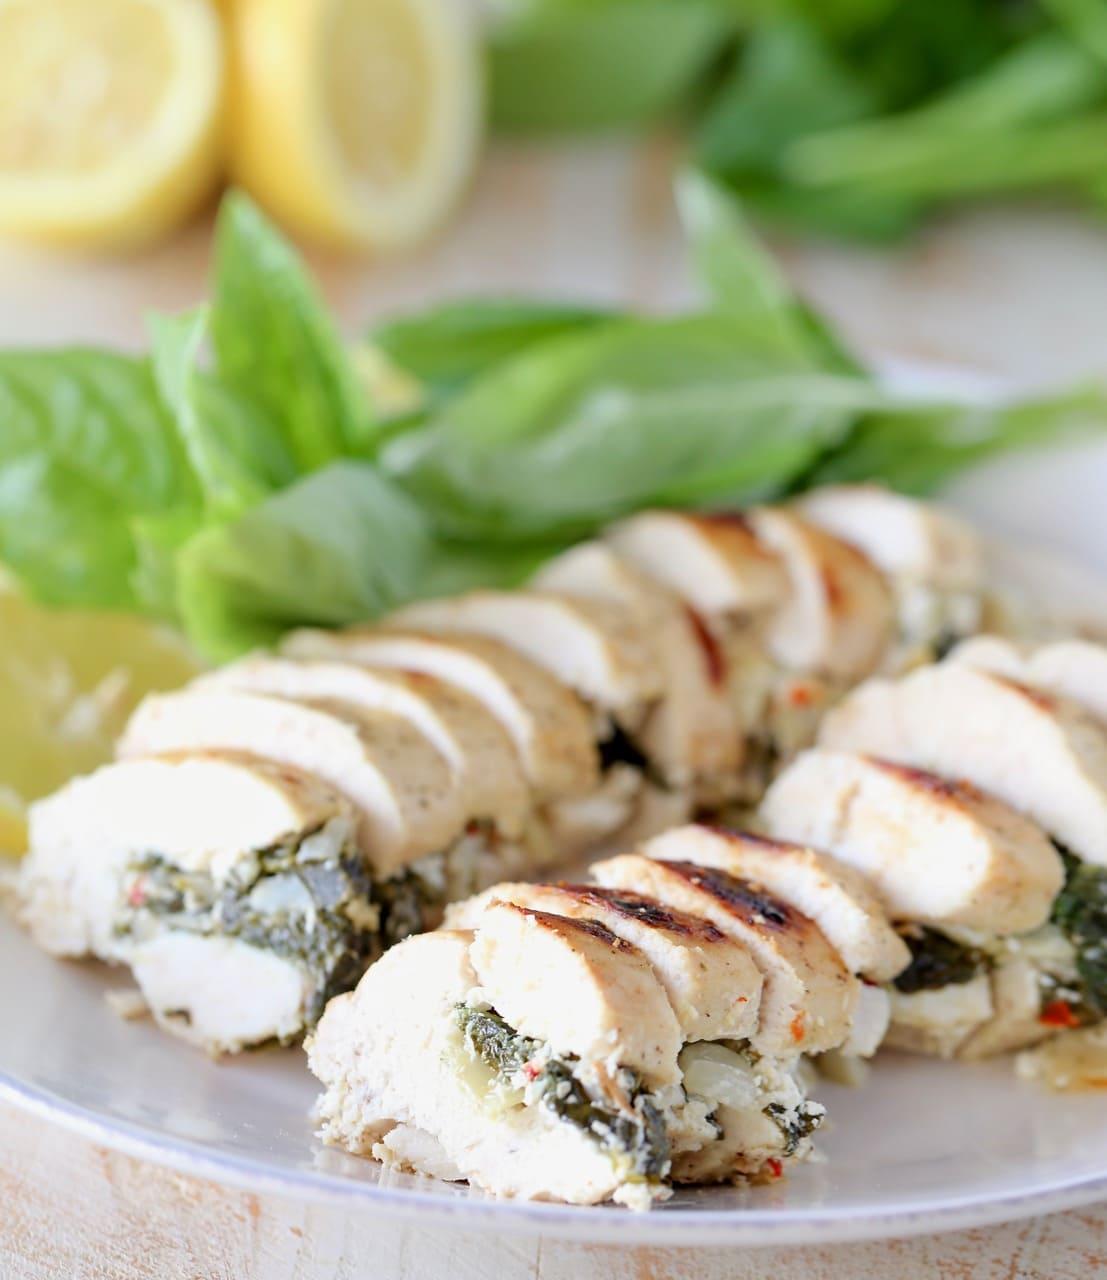 Sliced Spinach Artichoke Stuffed Chicken Breasts